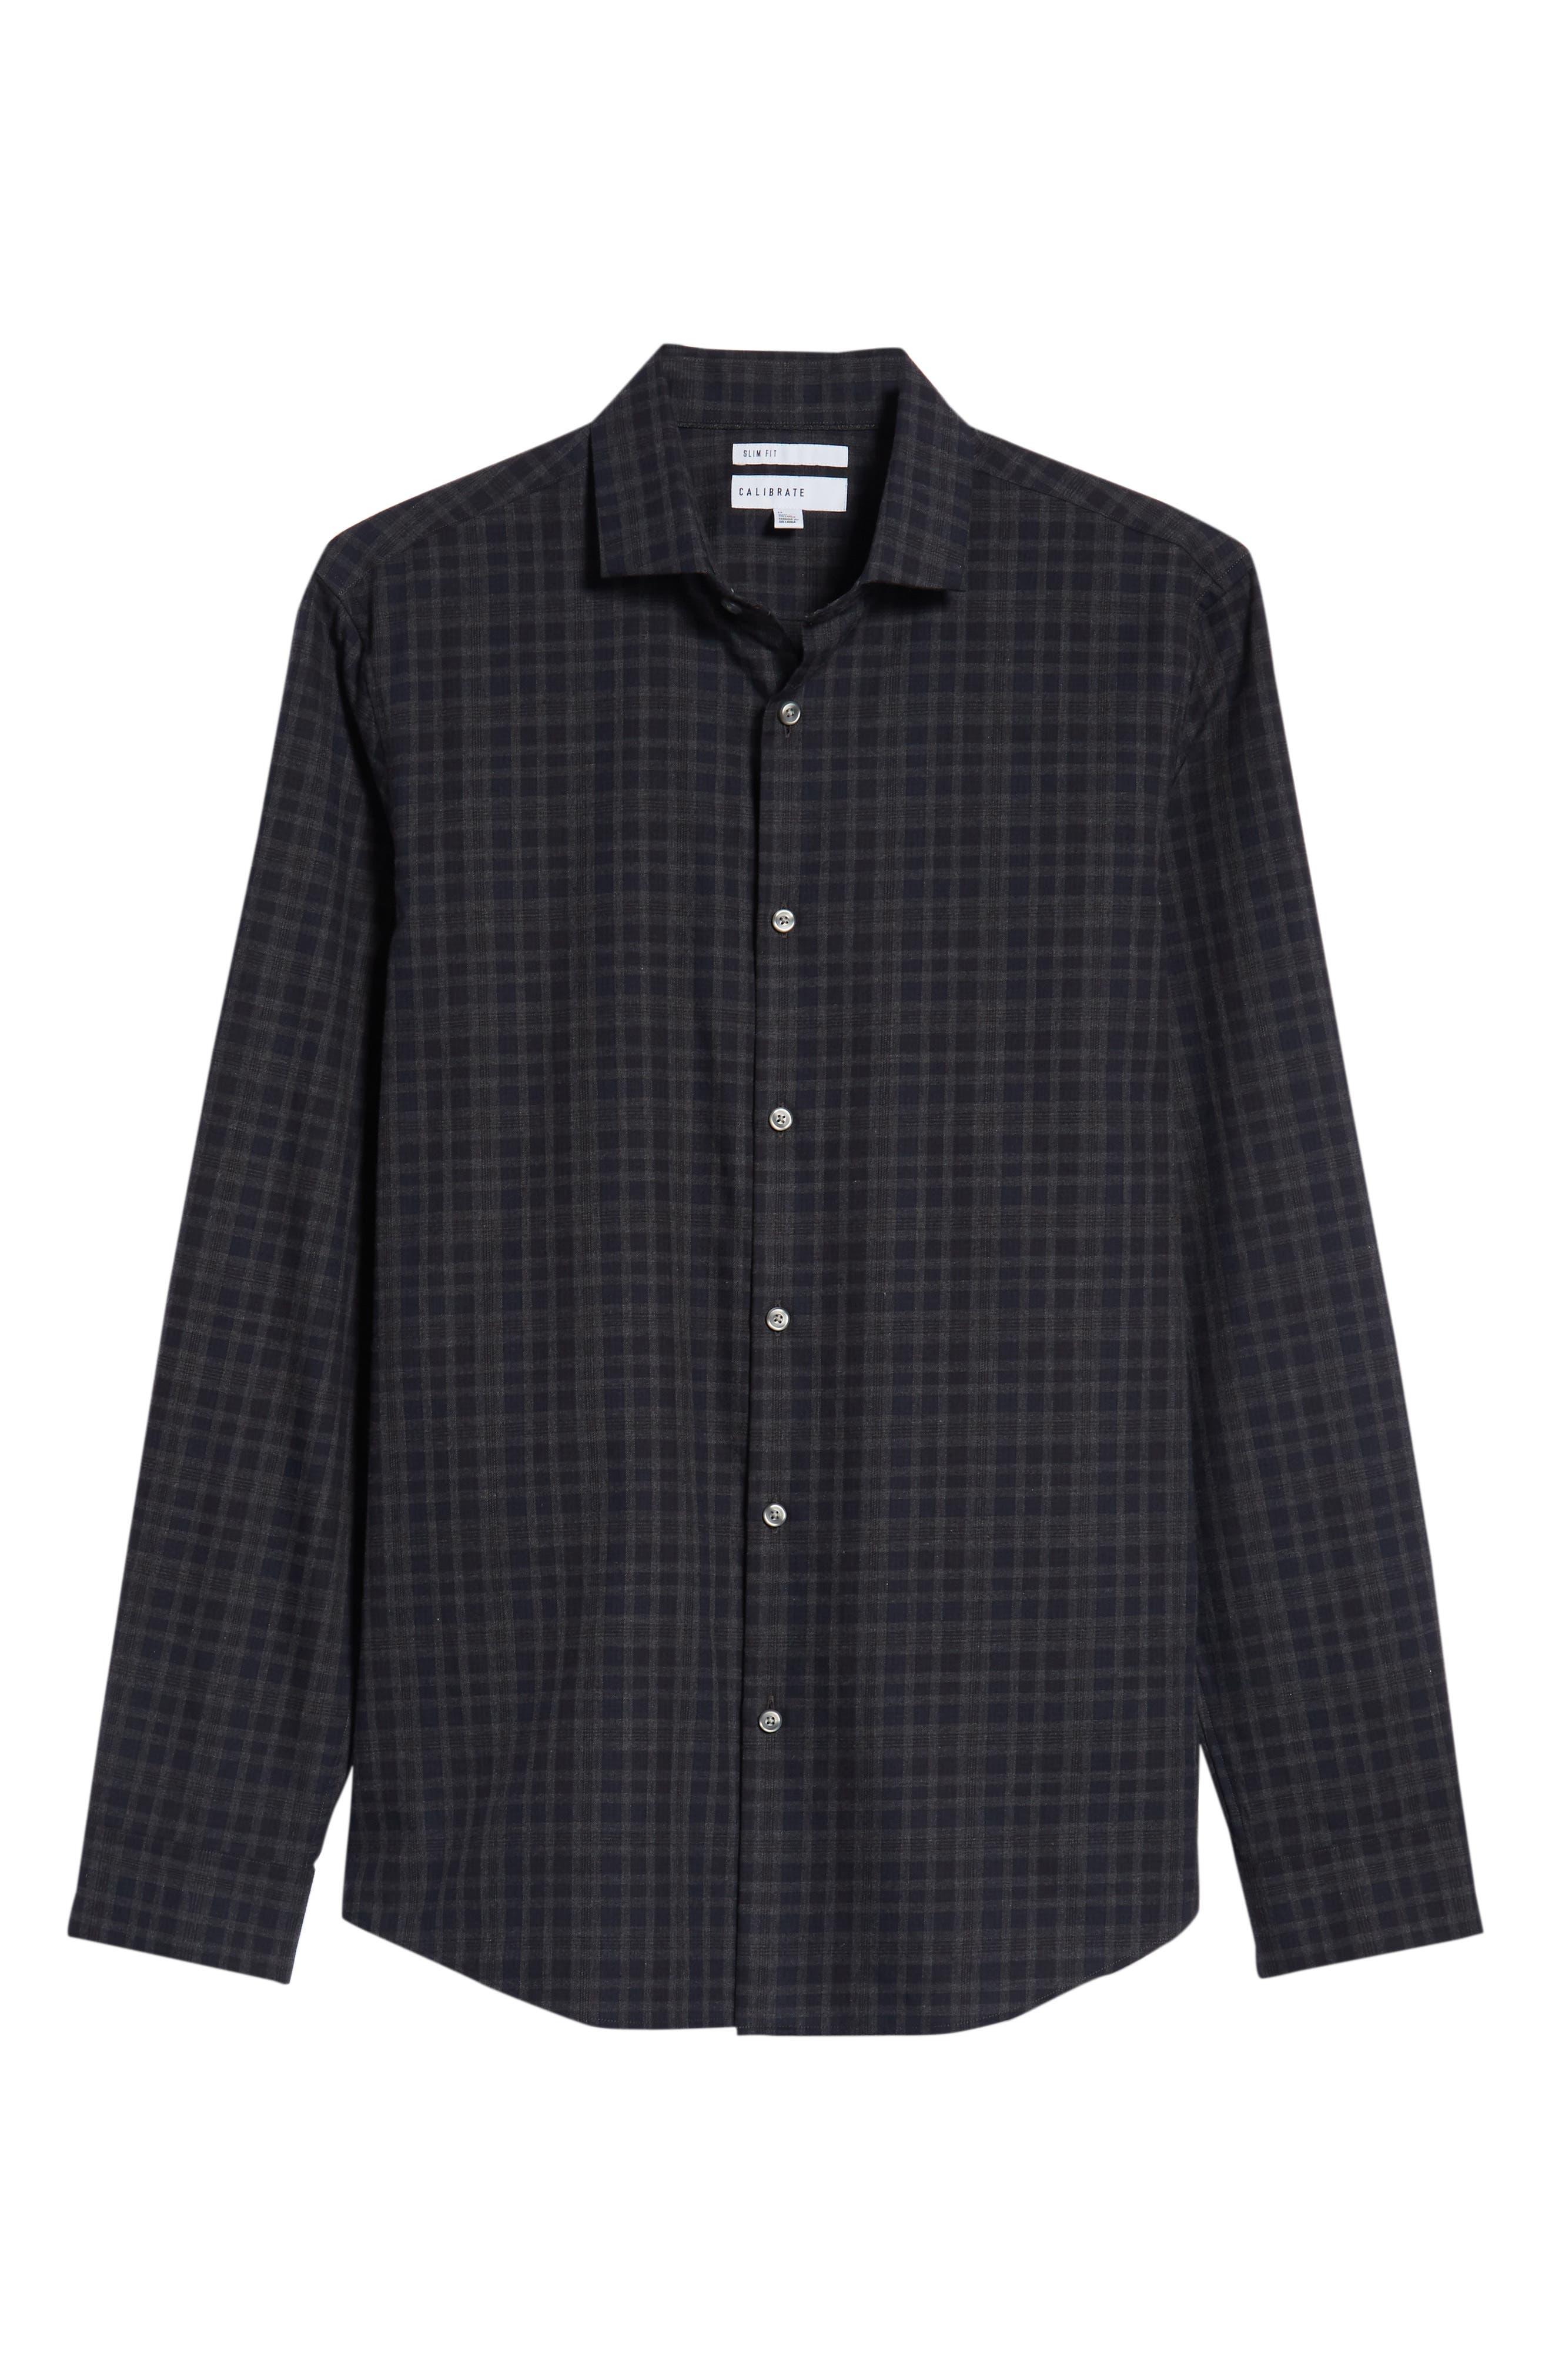 Slim Fit Check Flannel Sport Shirt,                             Alternate thumbnail 5, color,                             BLACK HEATHER NAVY CHECK